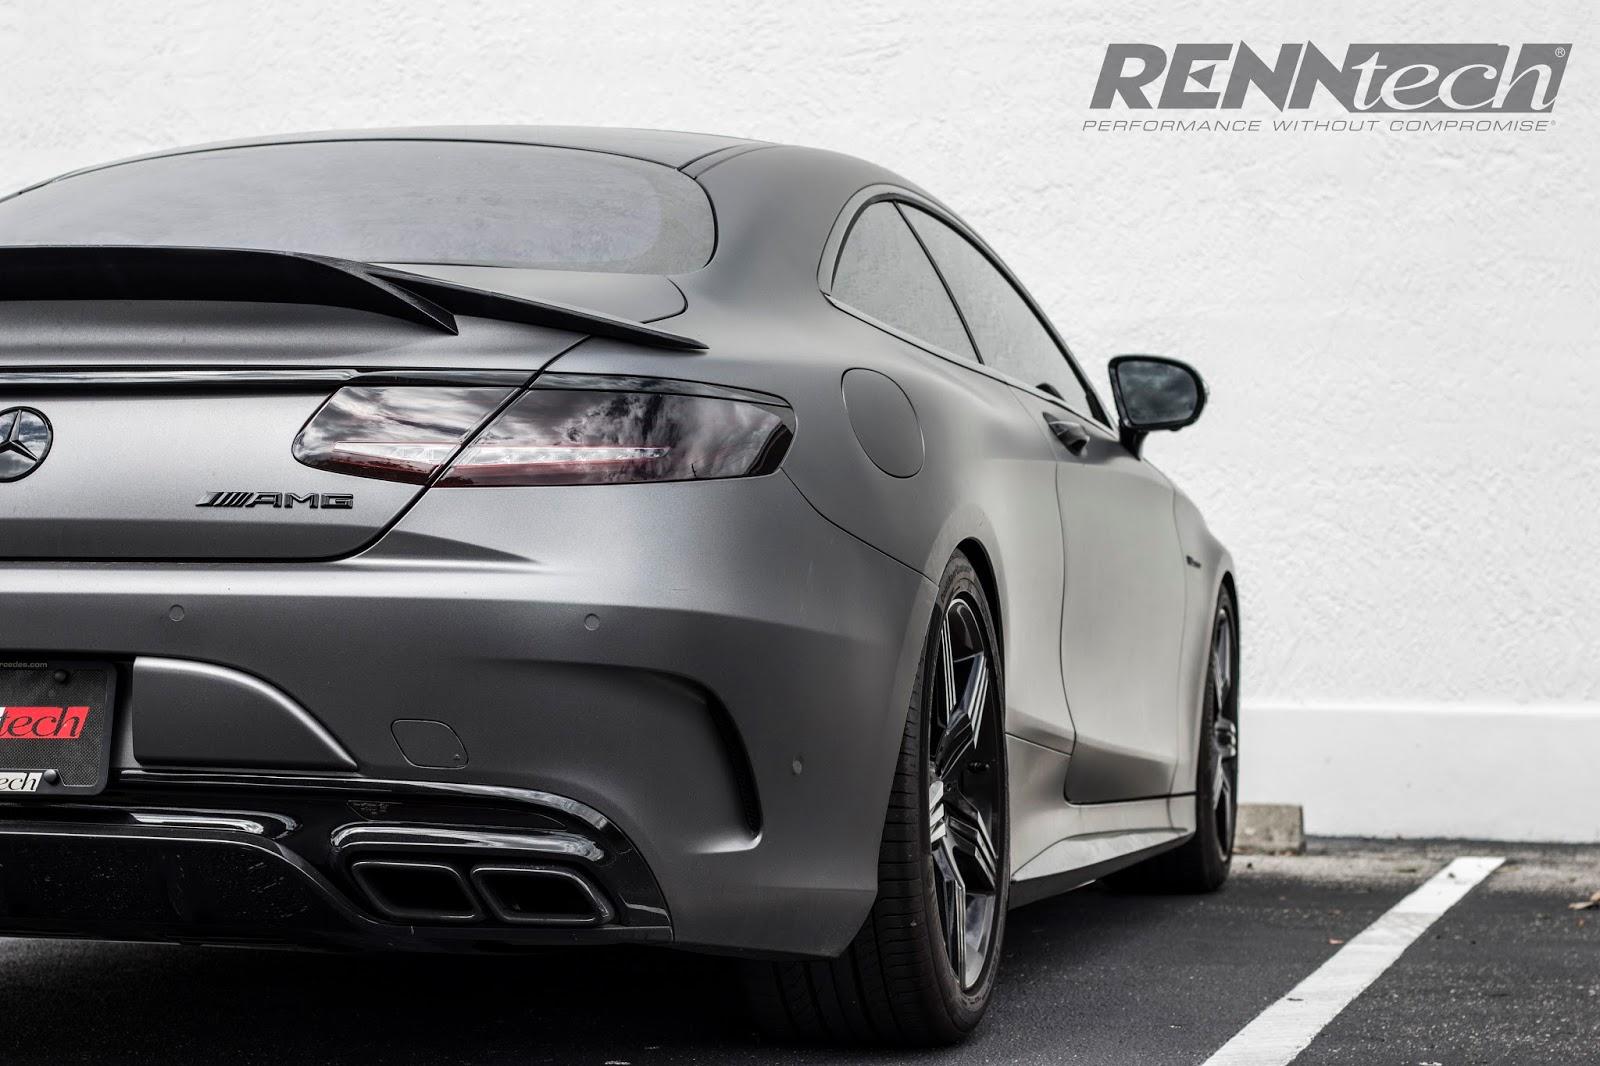 Mercedes Benz C217 S63 AMG Coupe By RENNtech BENZTUNING